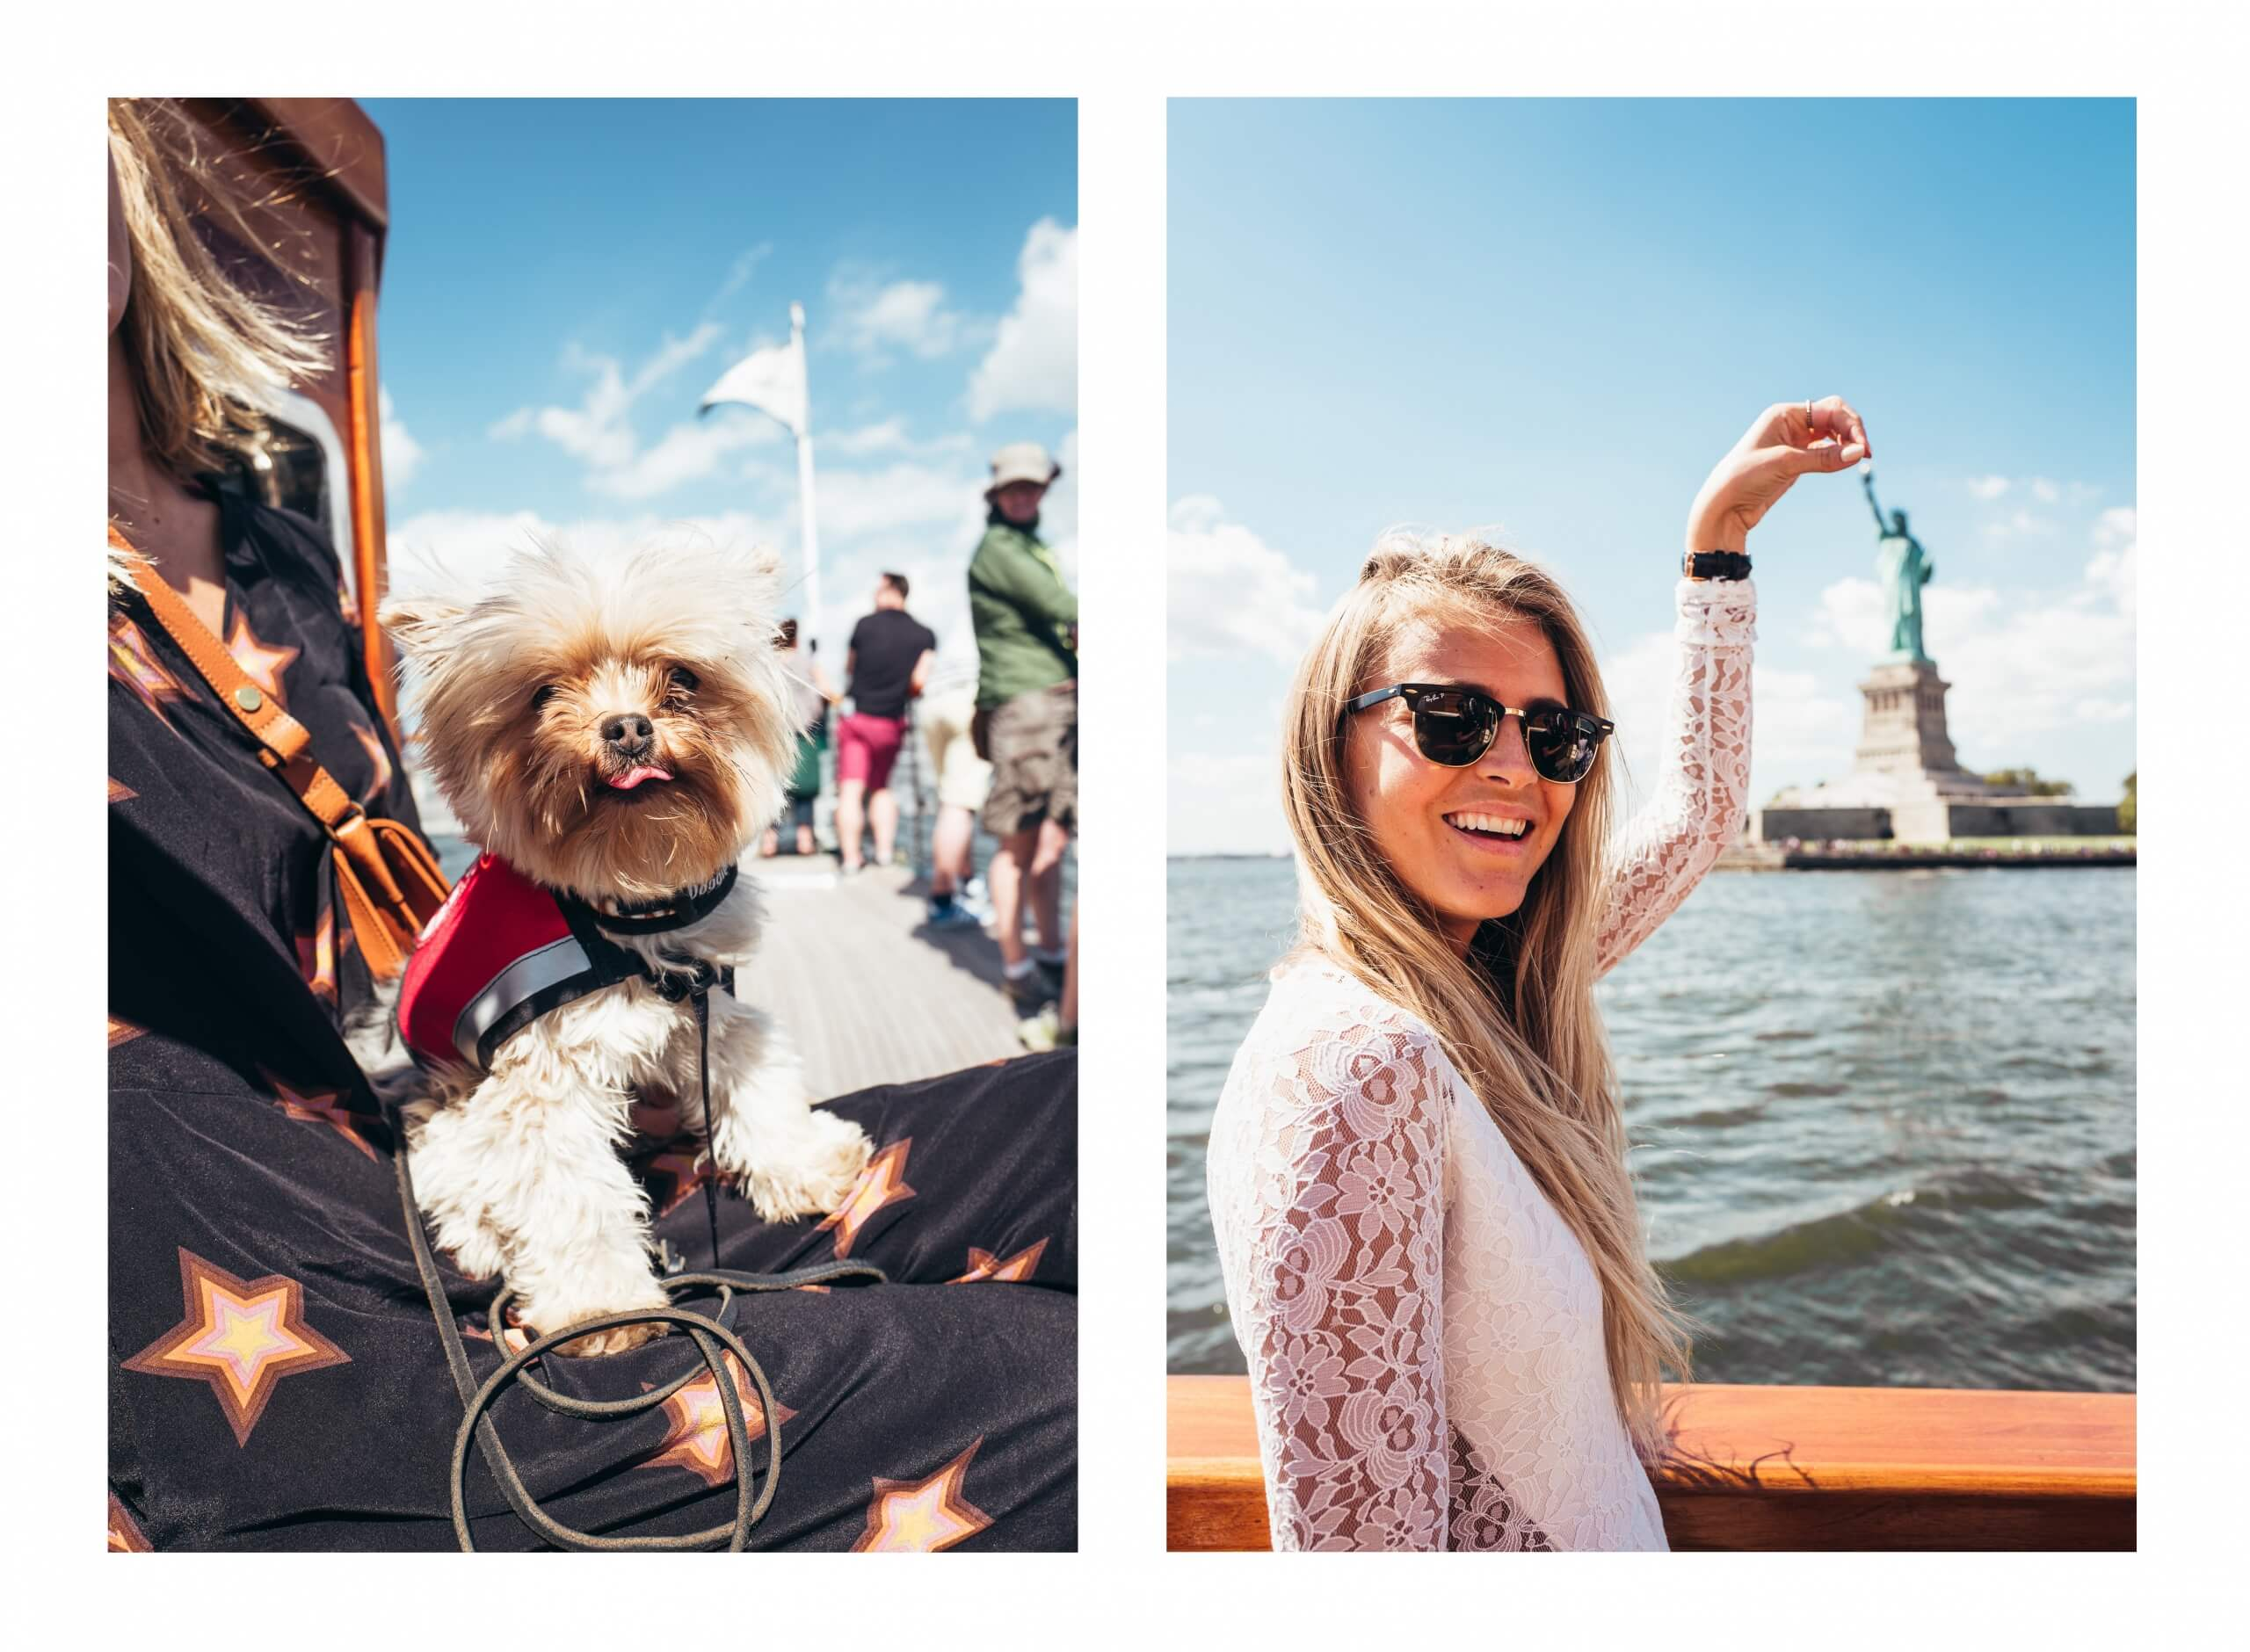 janni-deler-new-york-tour-boatL1090443 copy